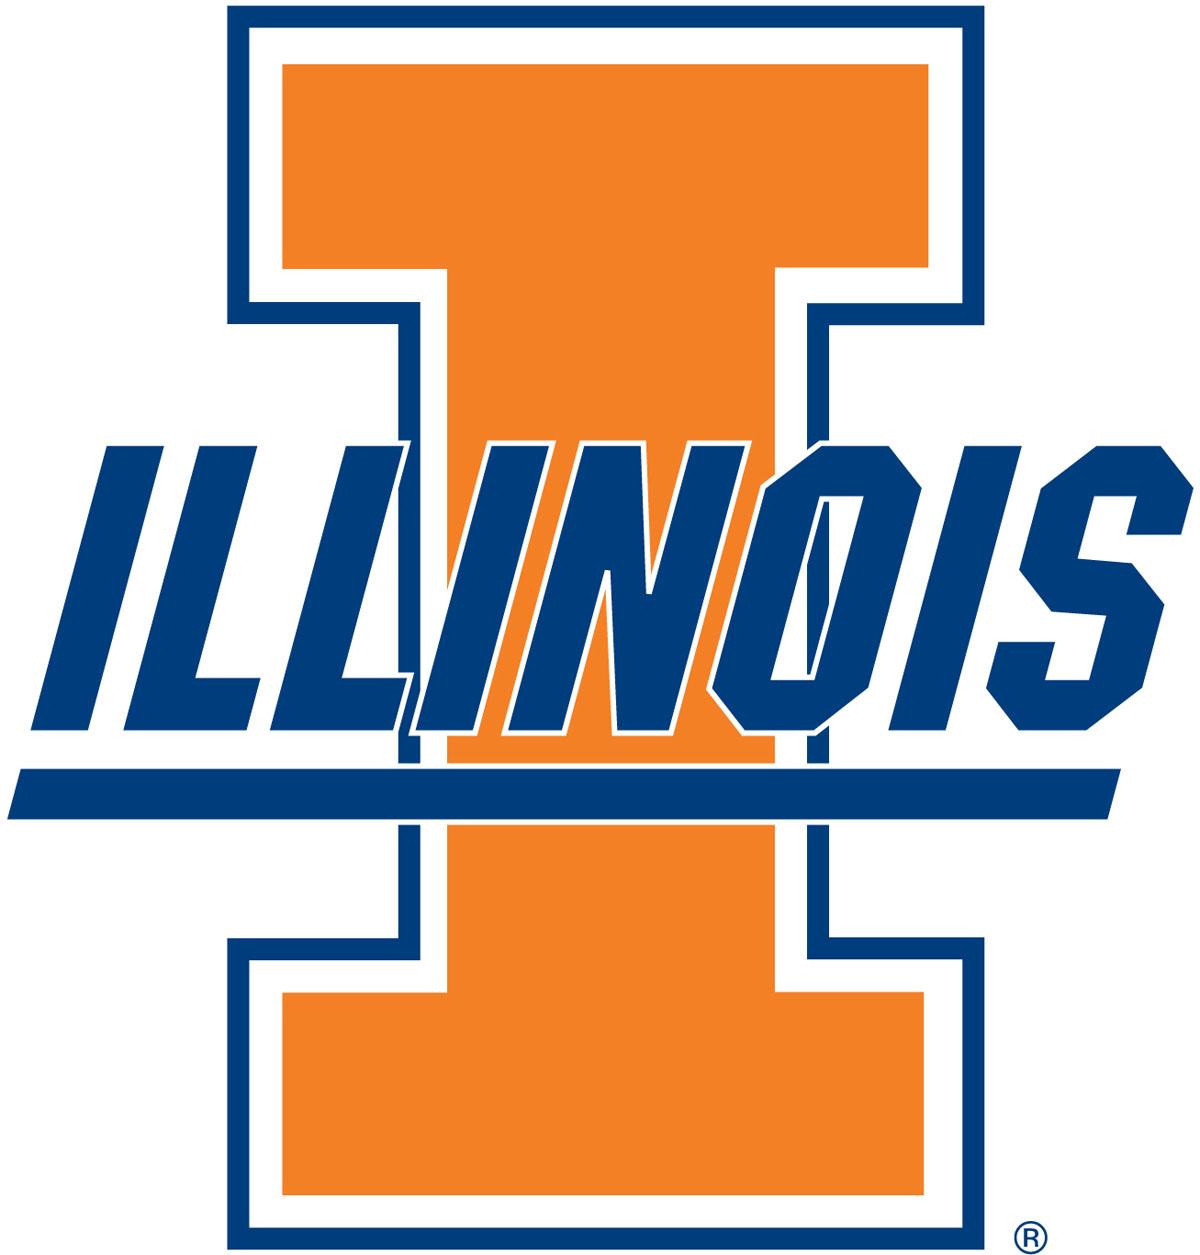 Fewer Illinois Freshman At University Of Illinois This Year